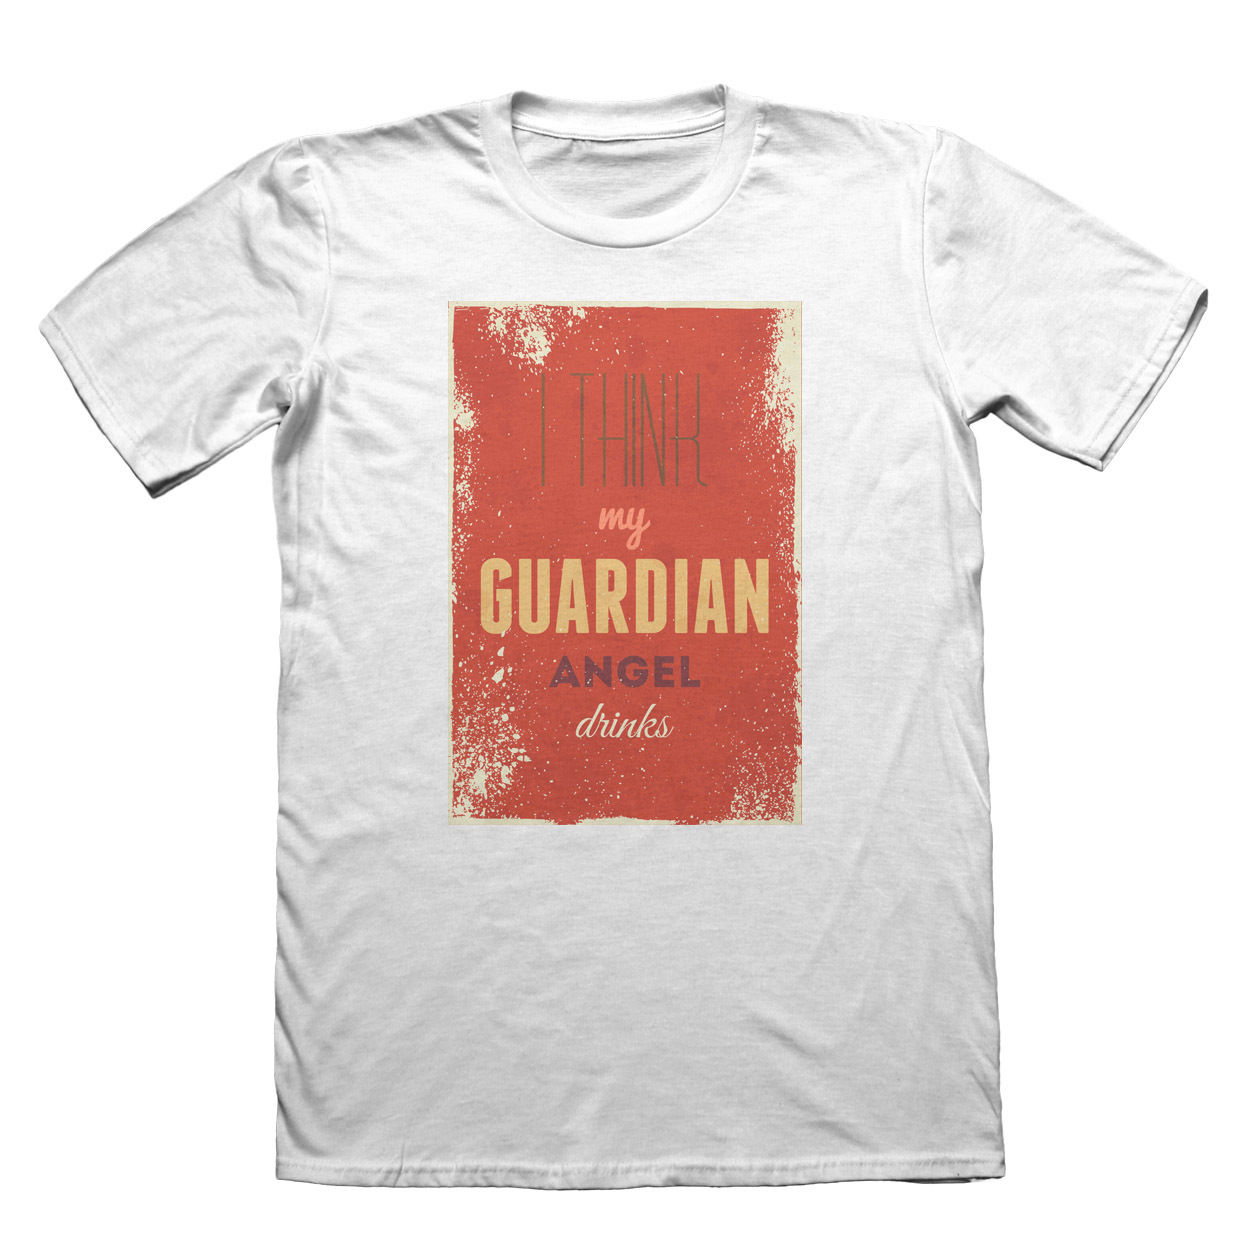 My Guardian Angel Drinks T-Shirt - Fathers Day Christmas Gift #7529 Fashion T-Shirt Tee top tee